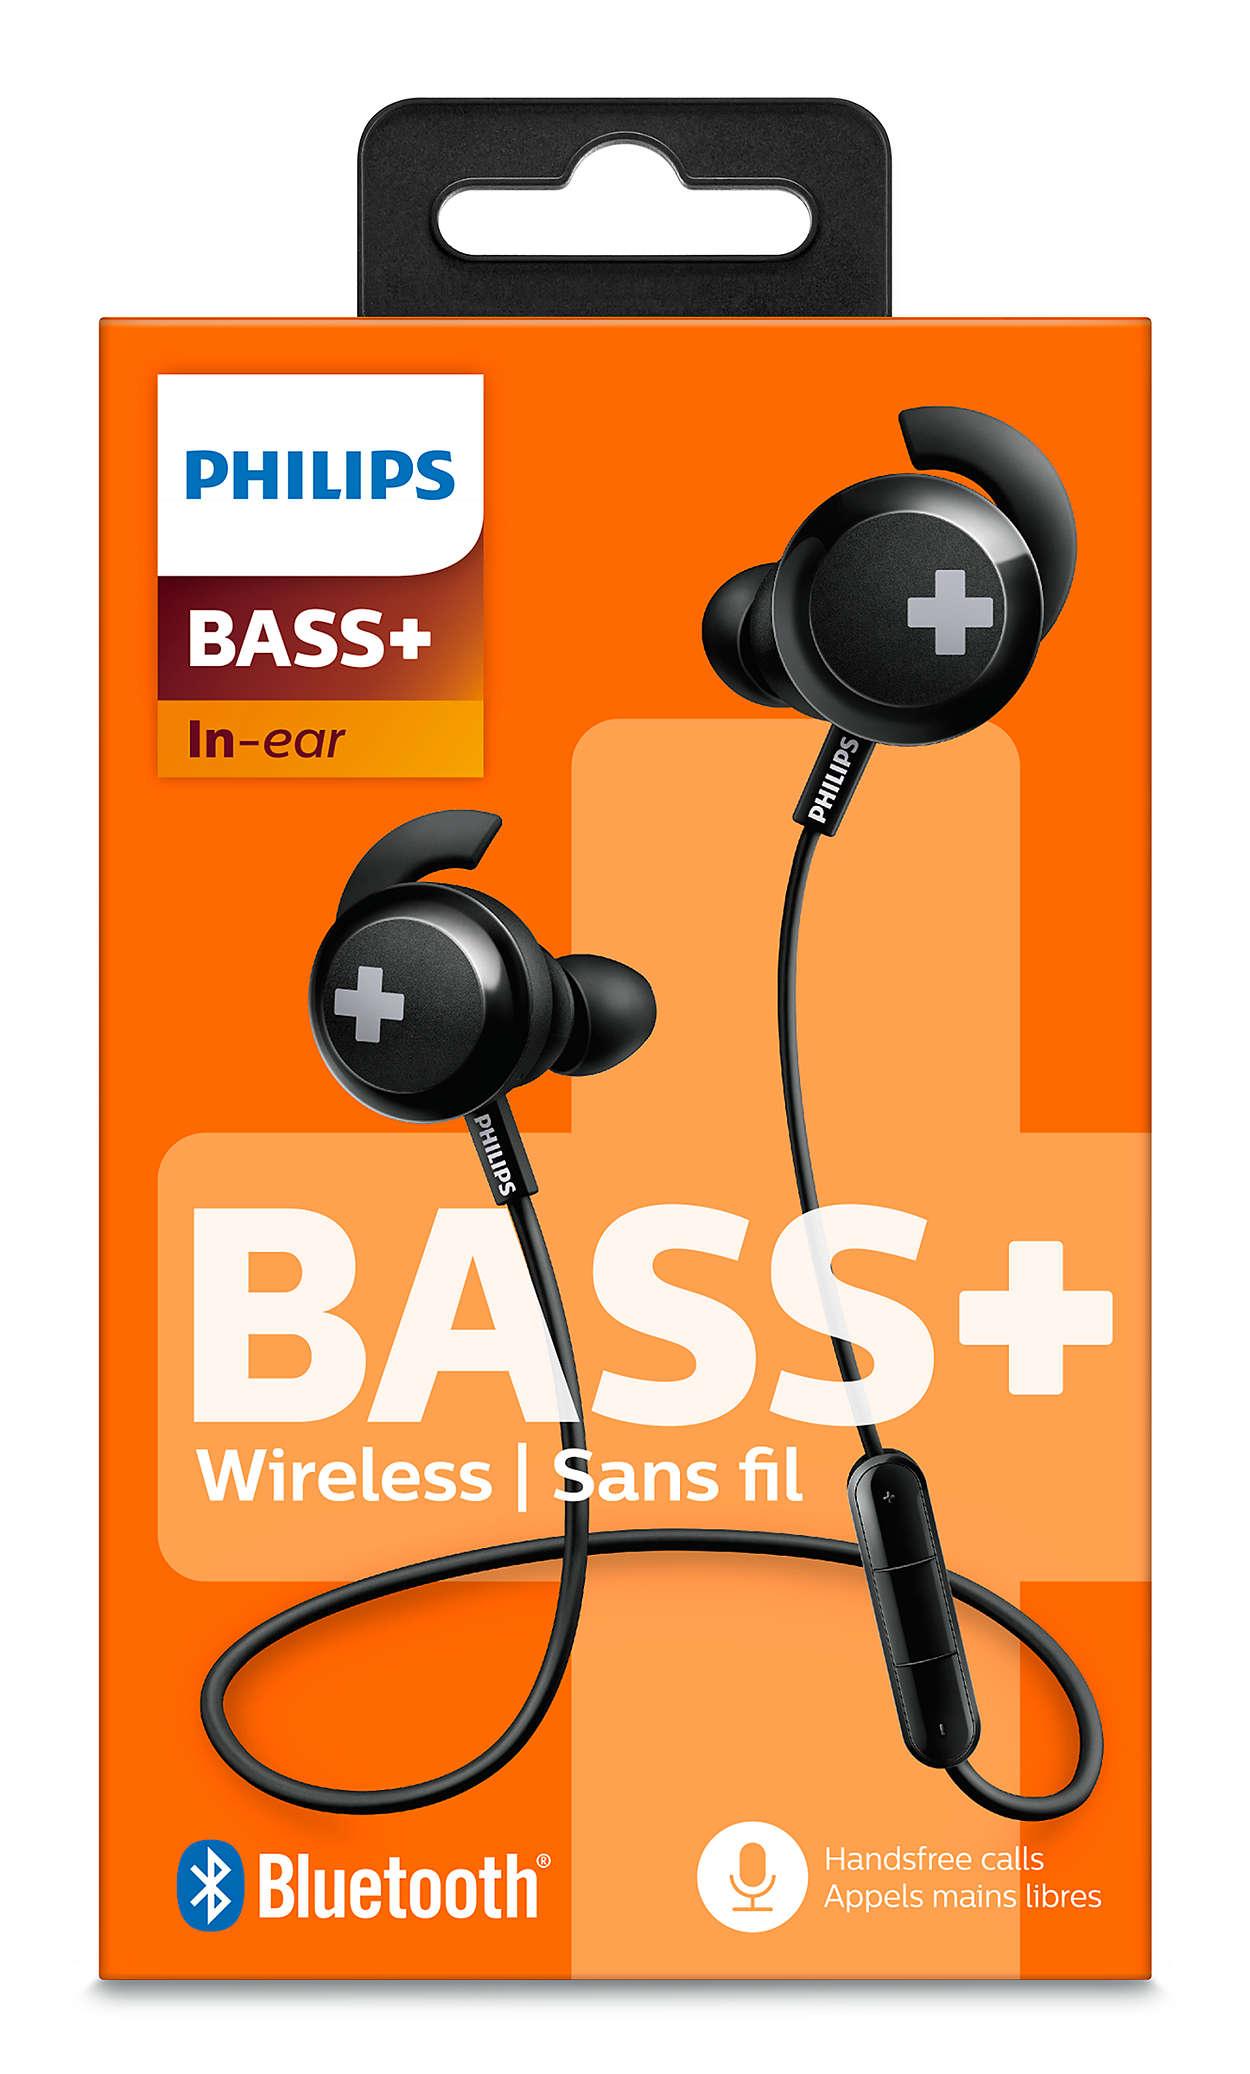 Bass Wireless Bluetooth Headphones Shb4305bk 27 Philips